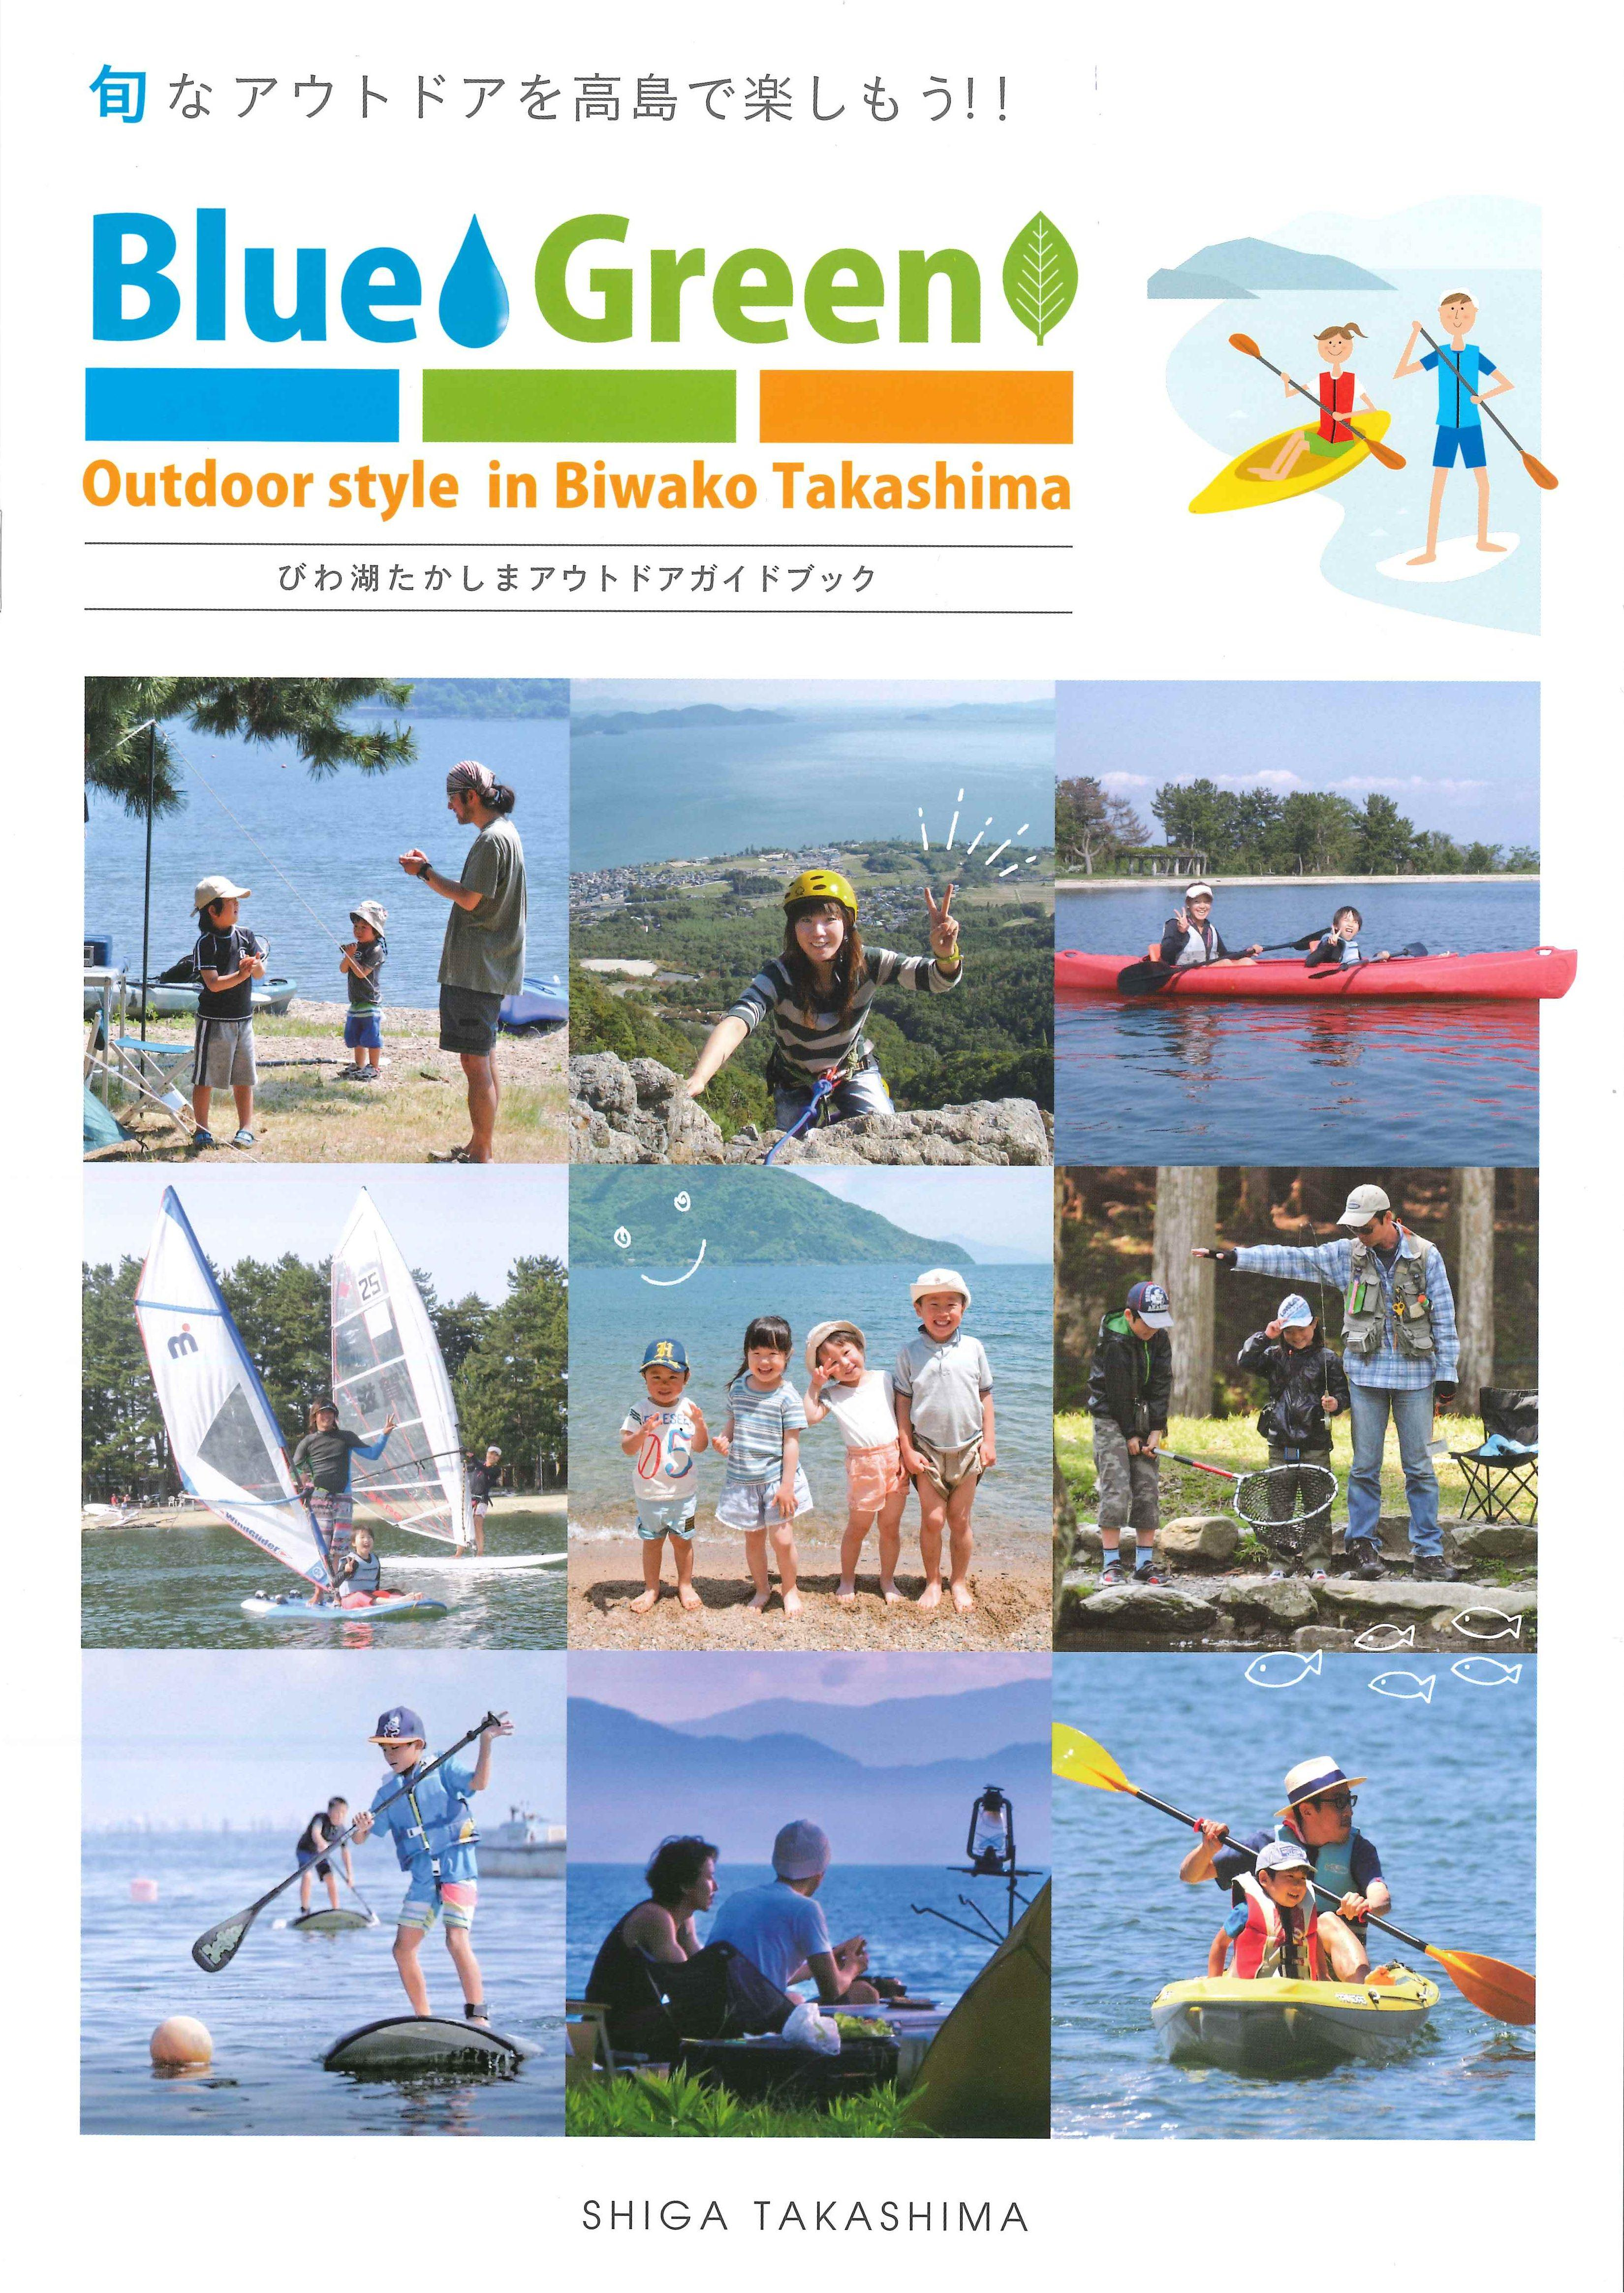 BlueGreen びわ湖高島アウトドアガイドブック